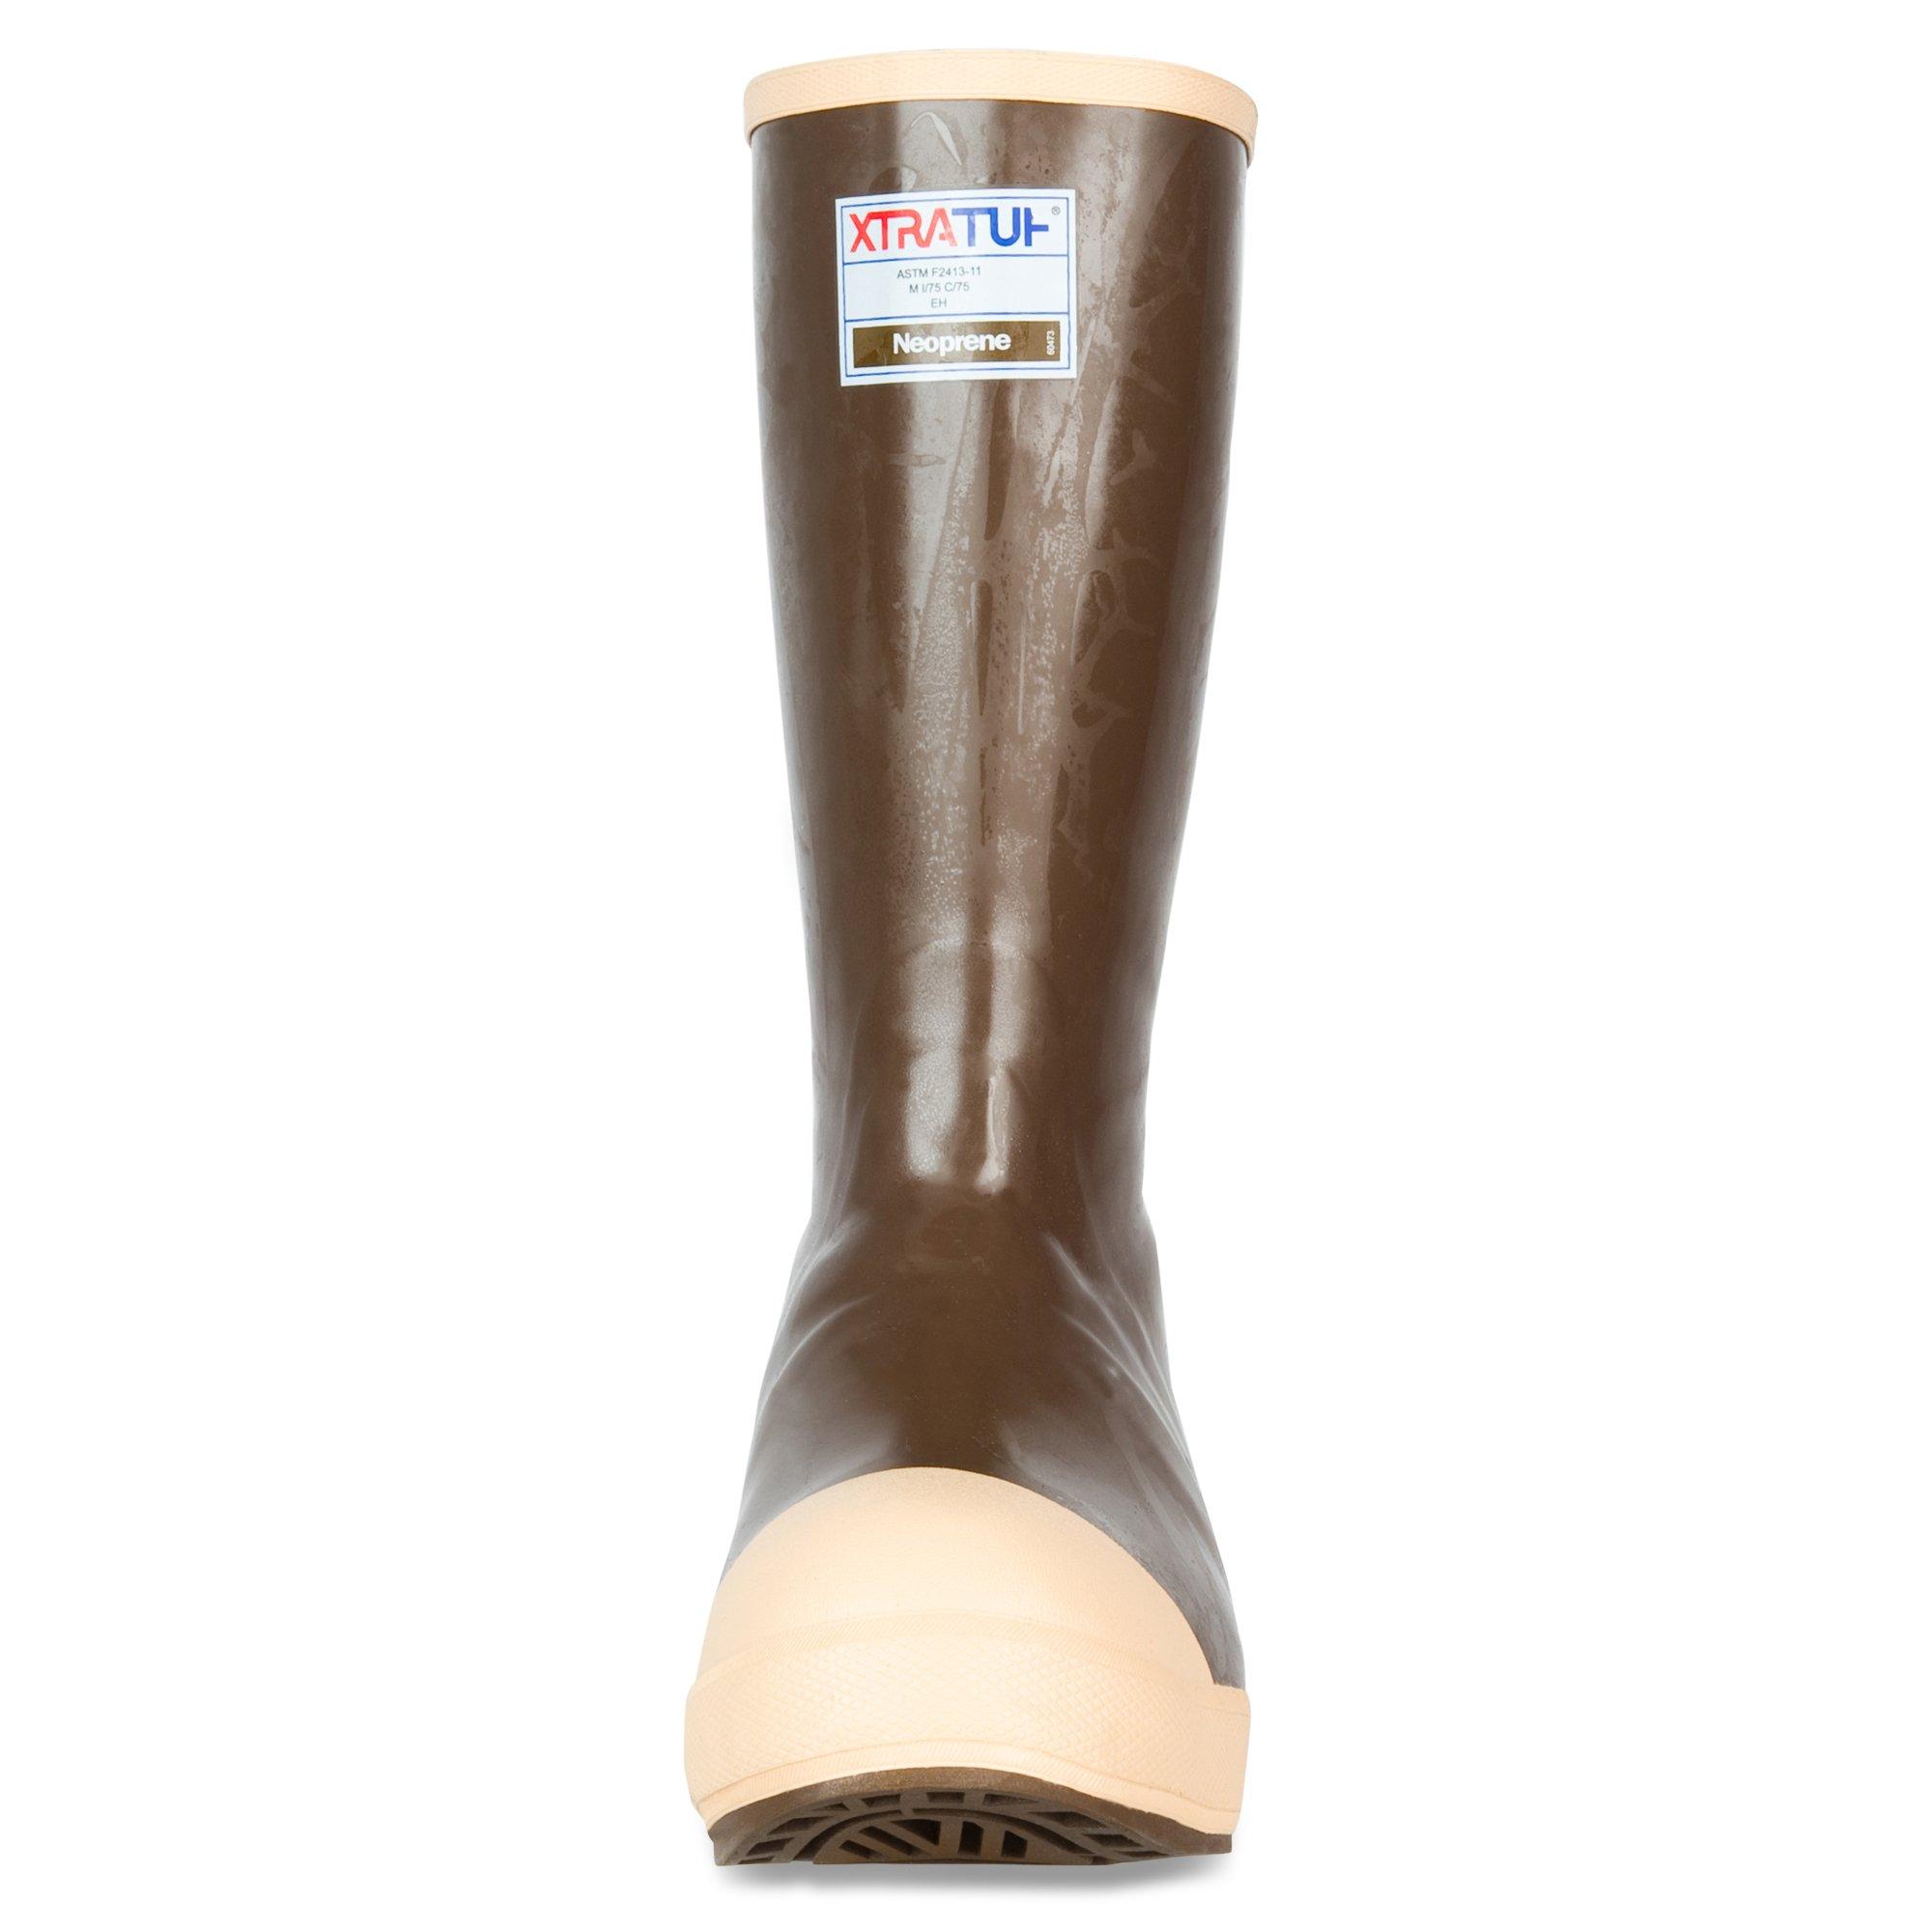 XTRATUF Legacy Series 15'' Neoprene Steel Toe Insulated Men's Fishing Boots, Copper & Tan (22273G) by Xtratuf (Image #1)